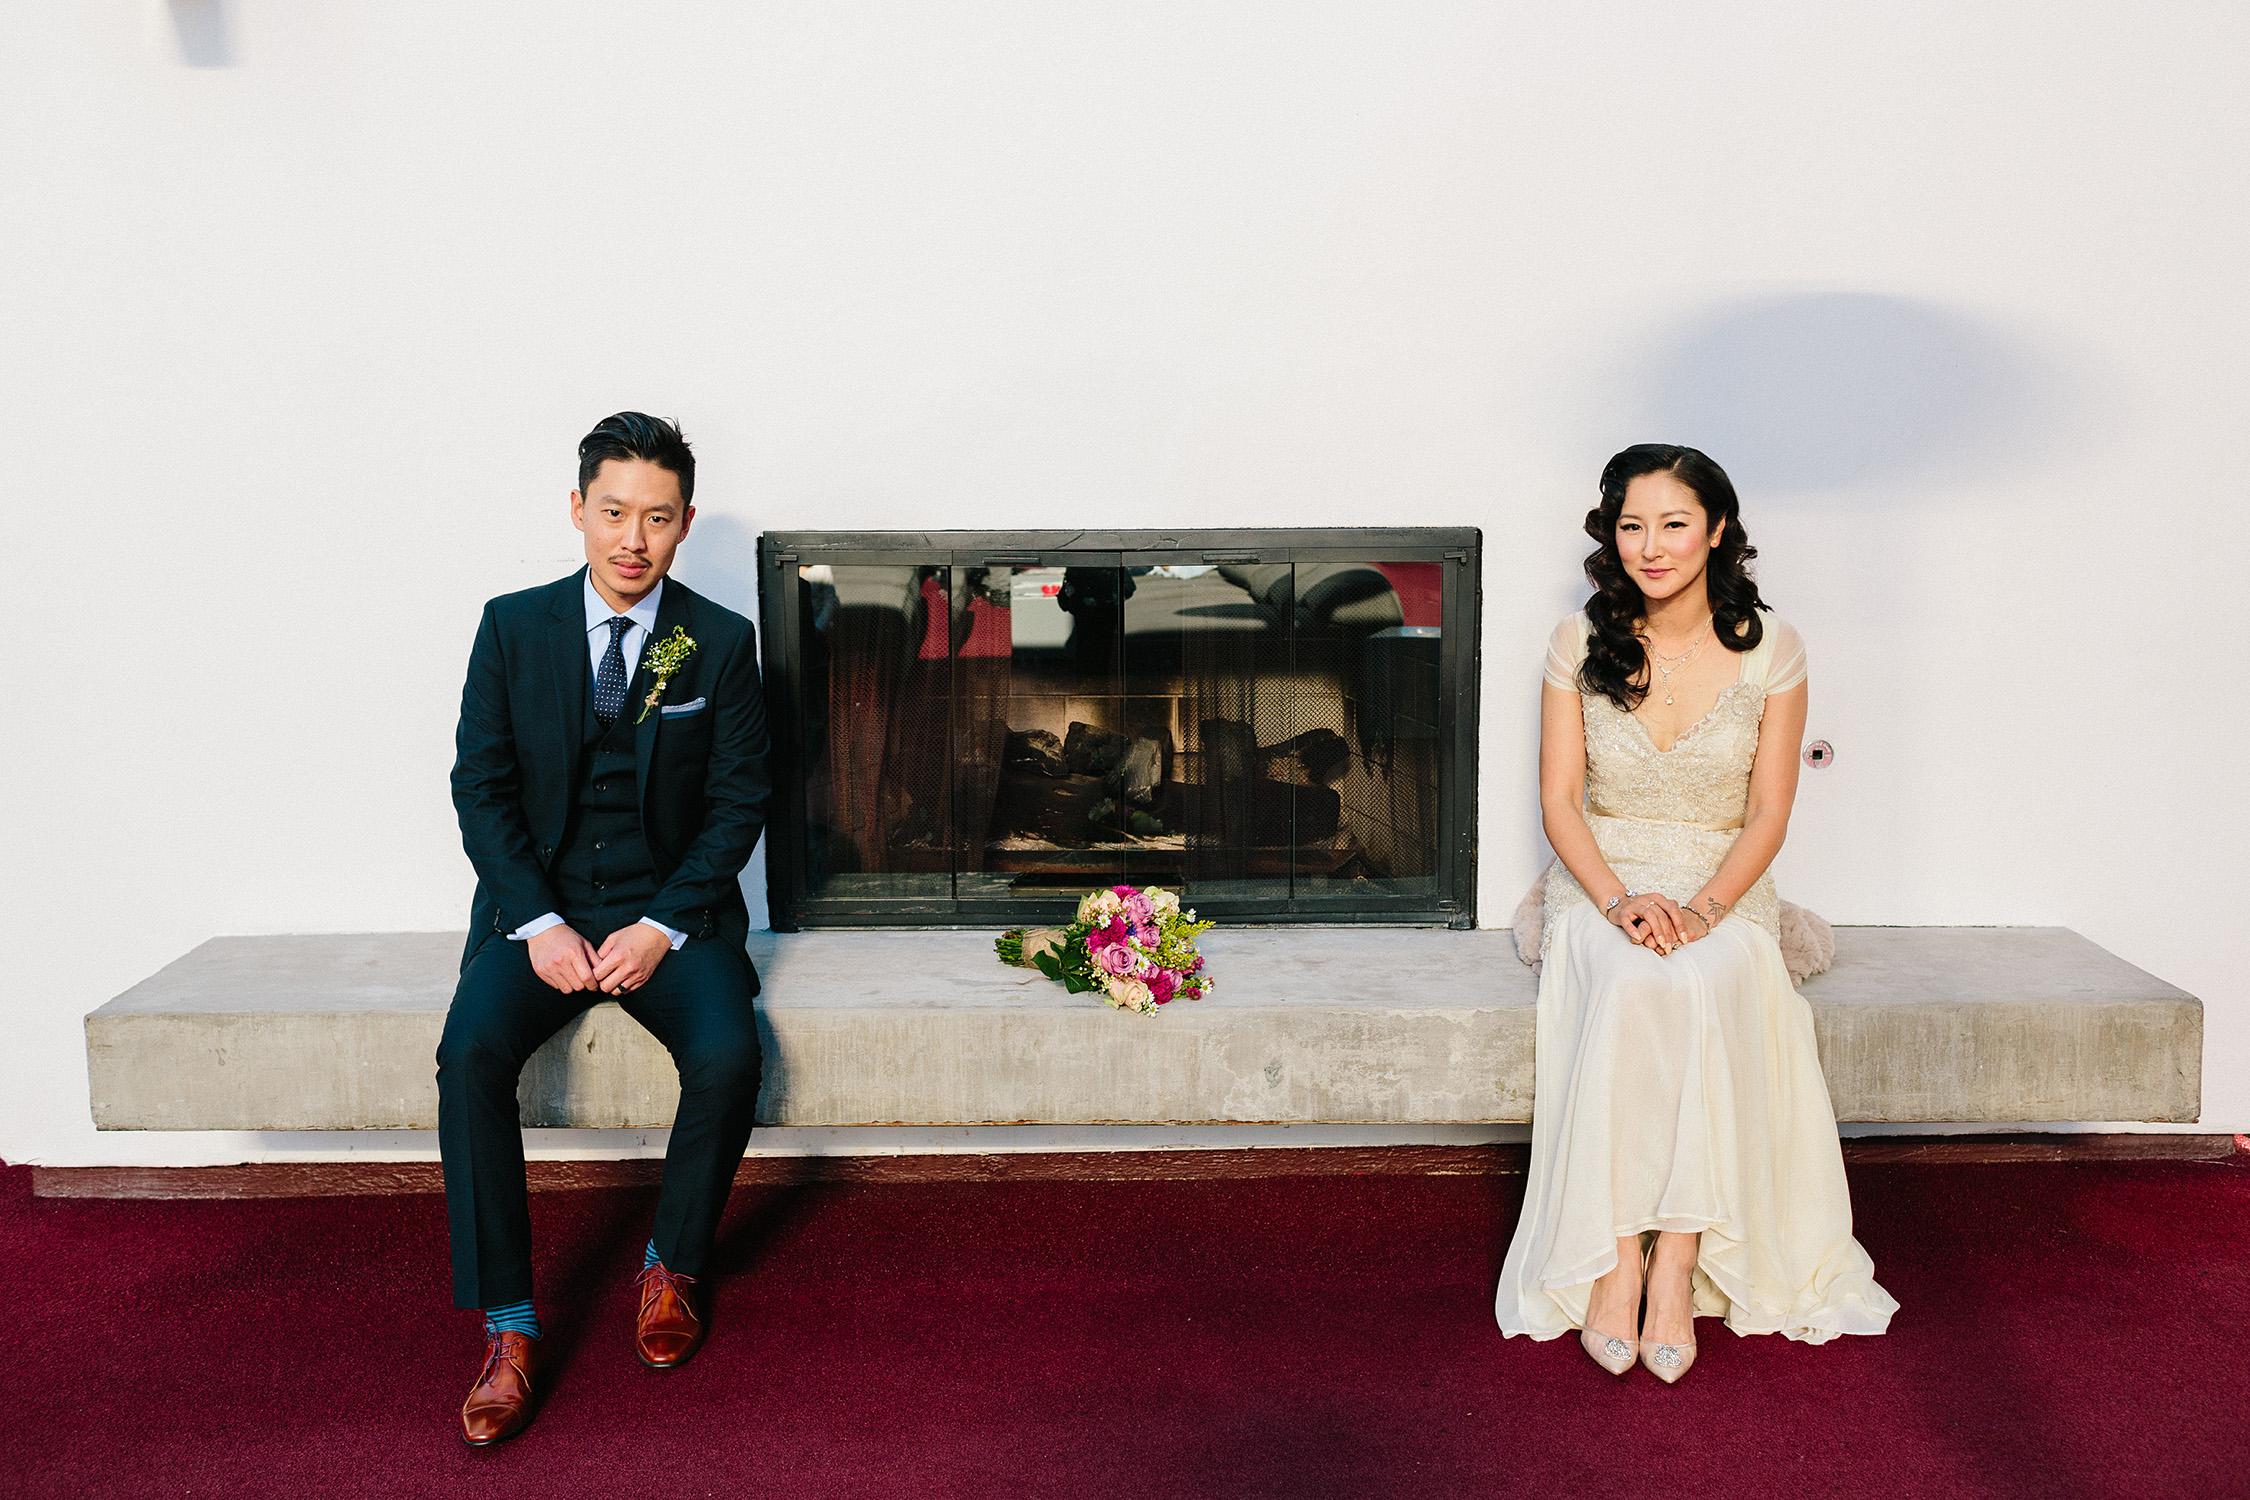 Standard_LA_wedding217.JPG